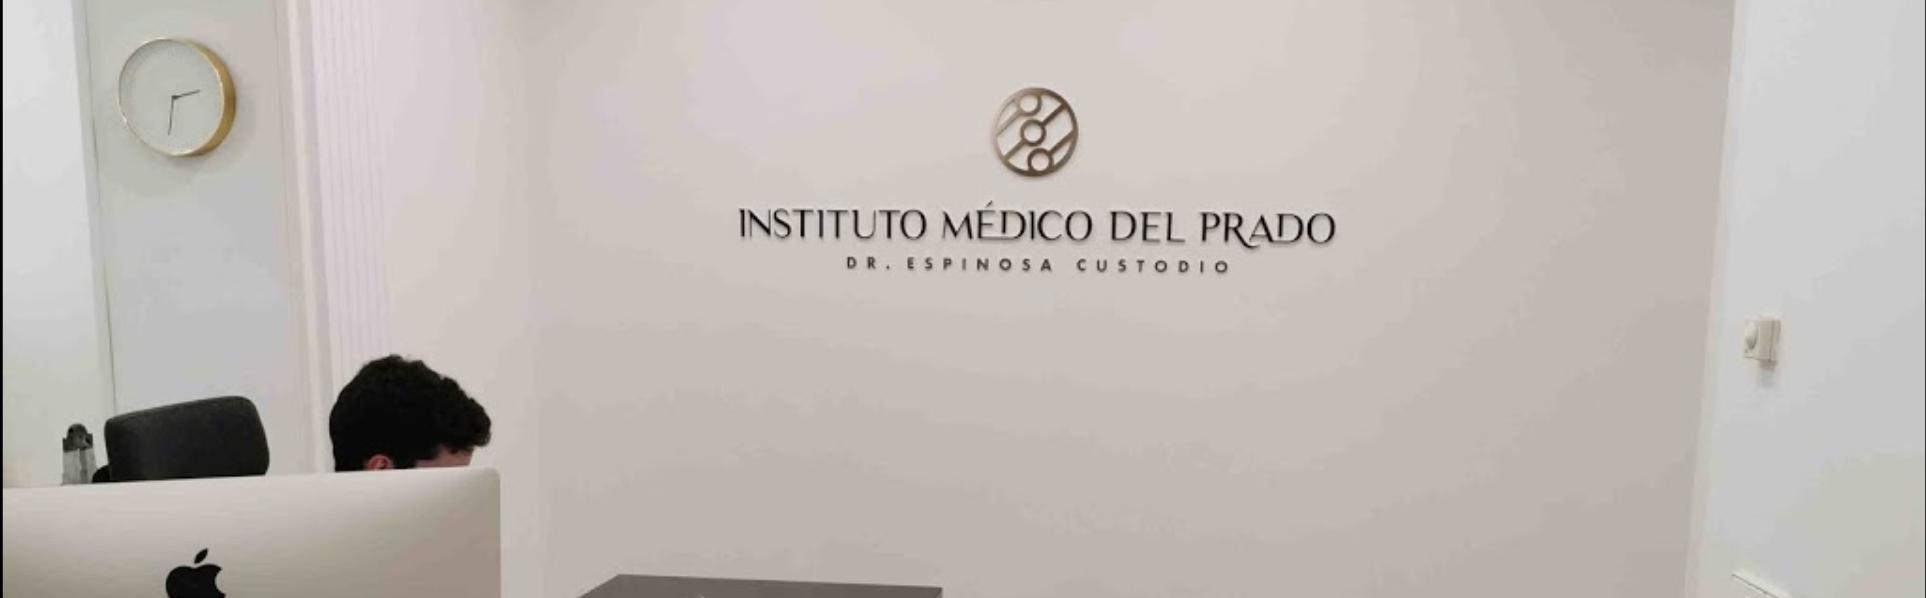 Mejor clínica de injerto capilar de Madrid